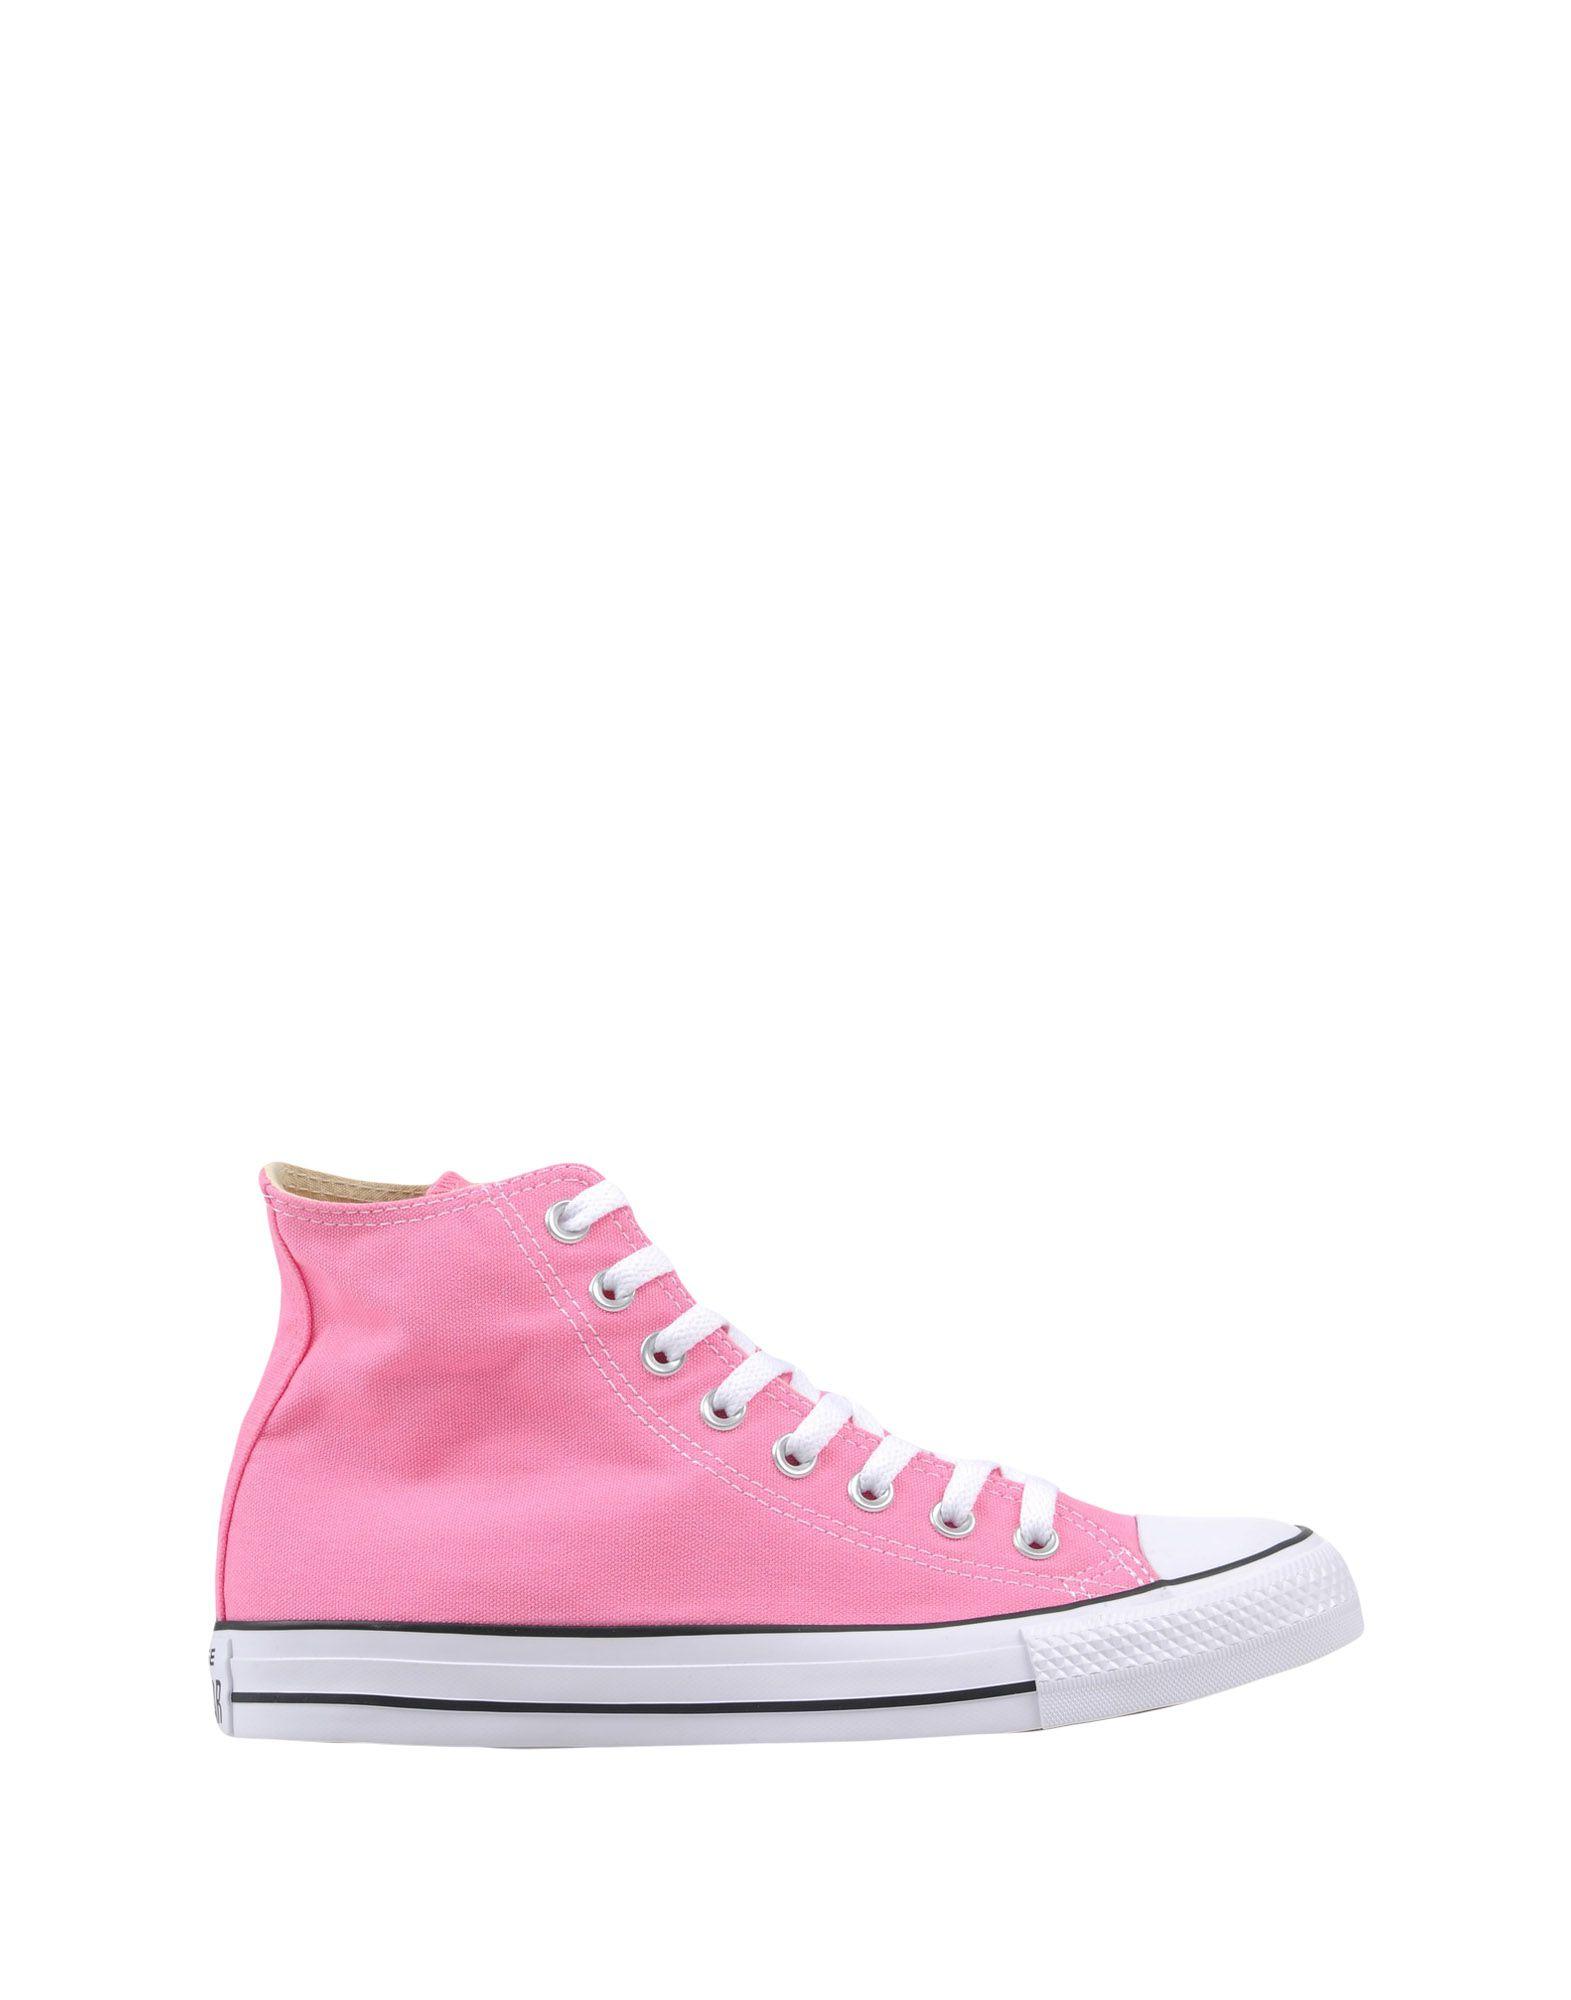 Sneakers Converse All Star Ctas Hi Canvas Core - Femme - Sneakers Converse All Star sur